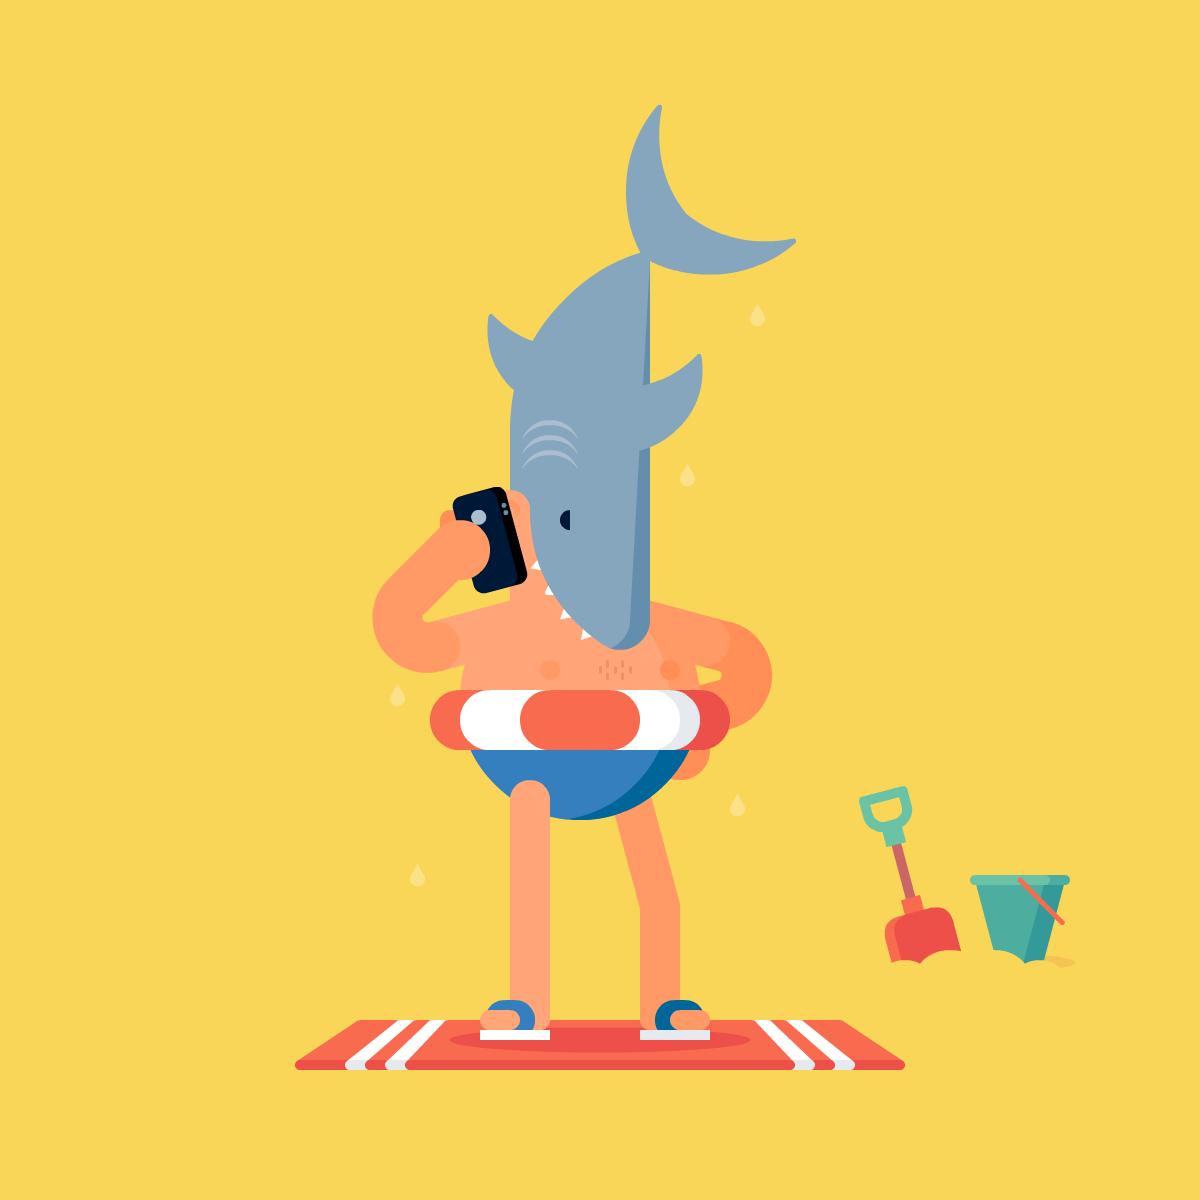 oscar_shark_v05.png